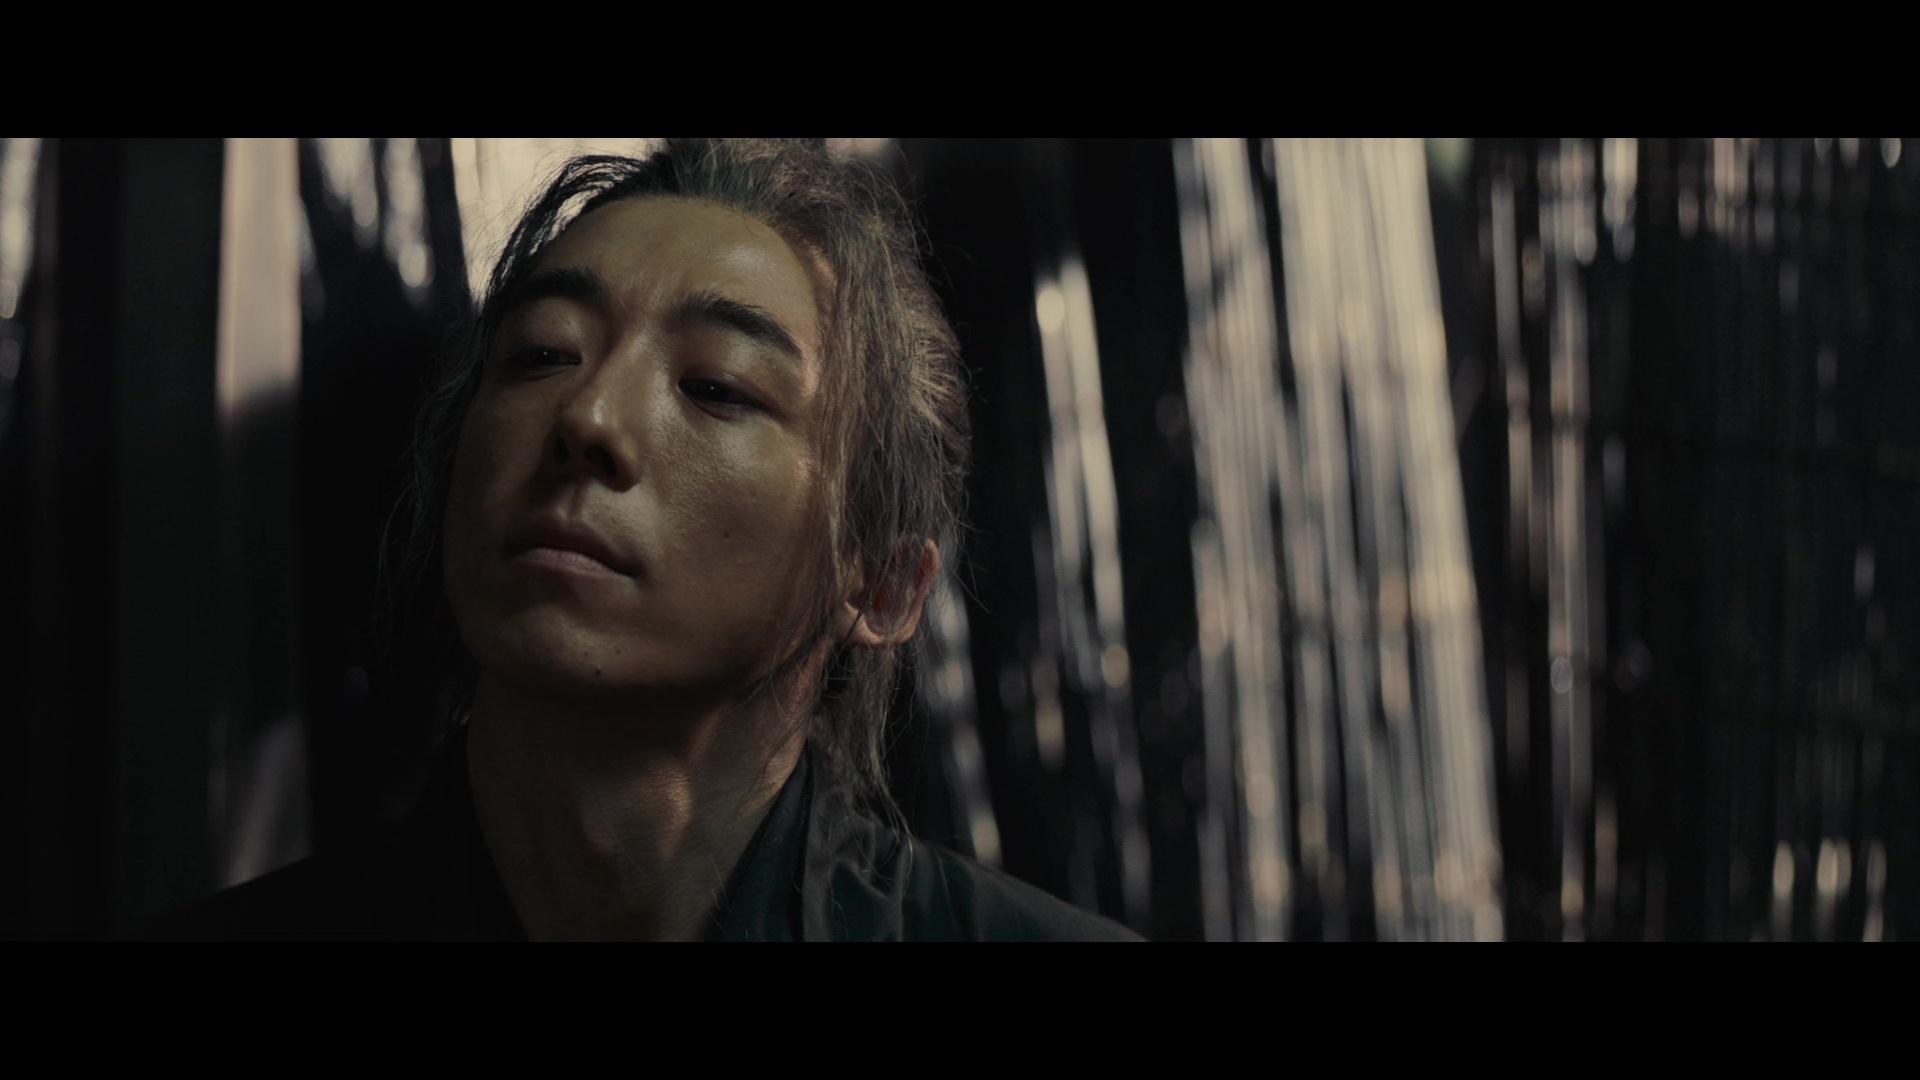 Samurái X: El origen (2021) 1080p WEB-DL Latino